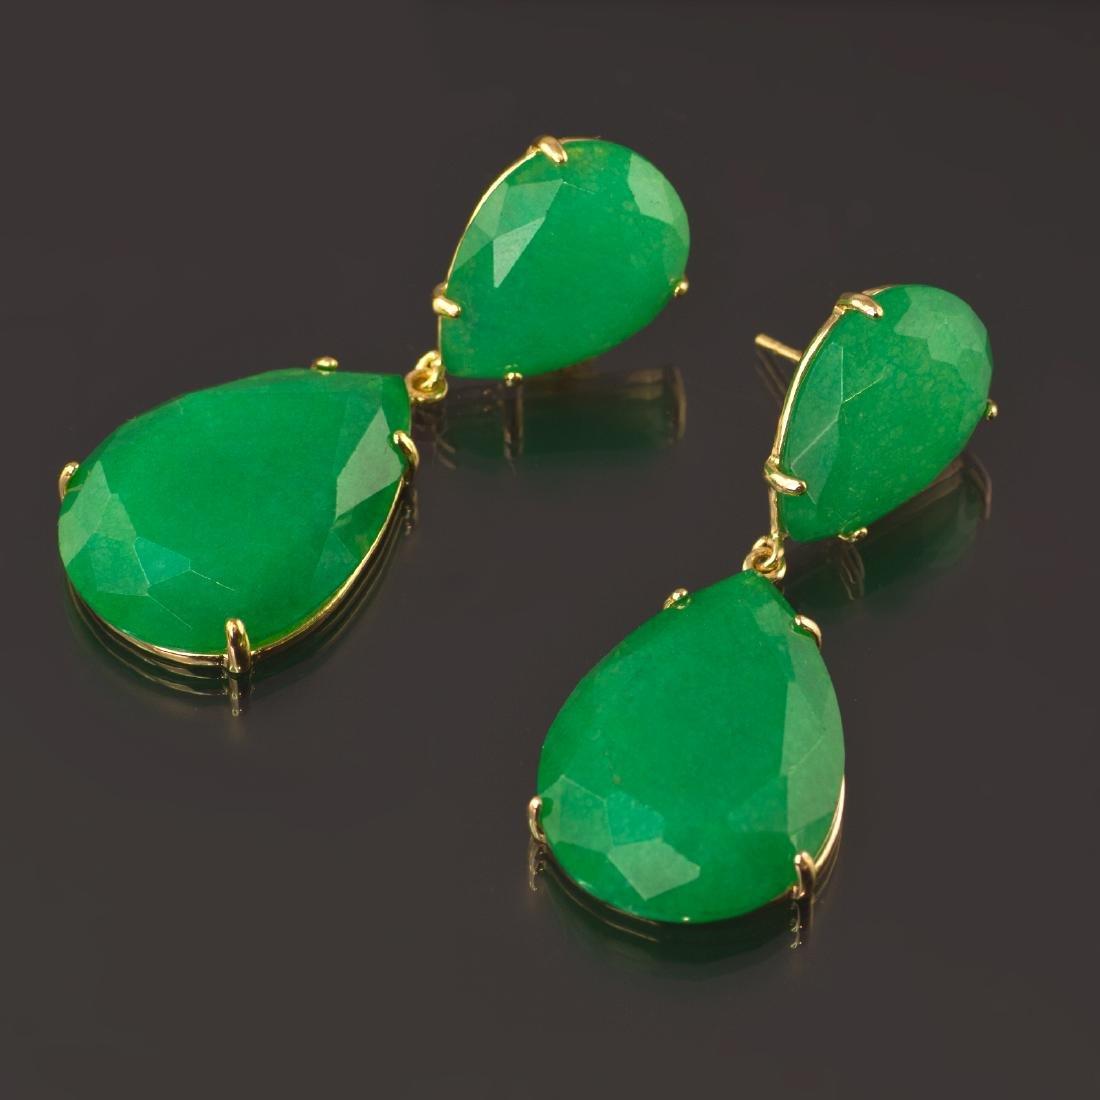 Emerald Green Jade Two Parts Earrings - 2